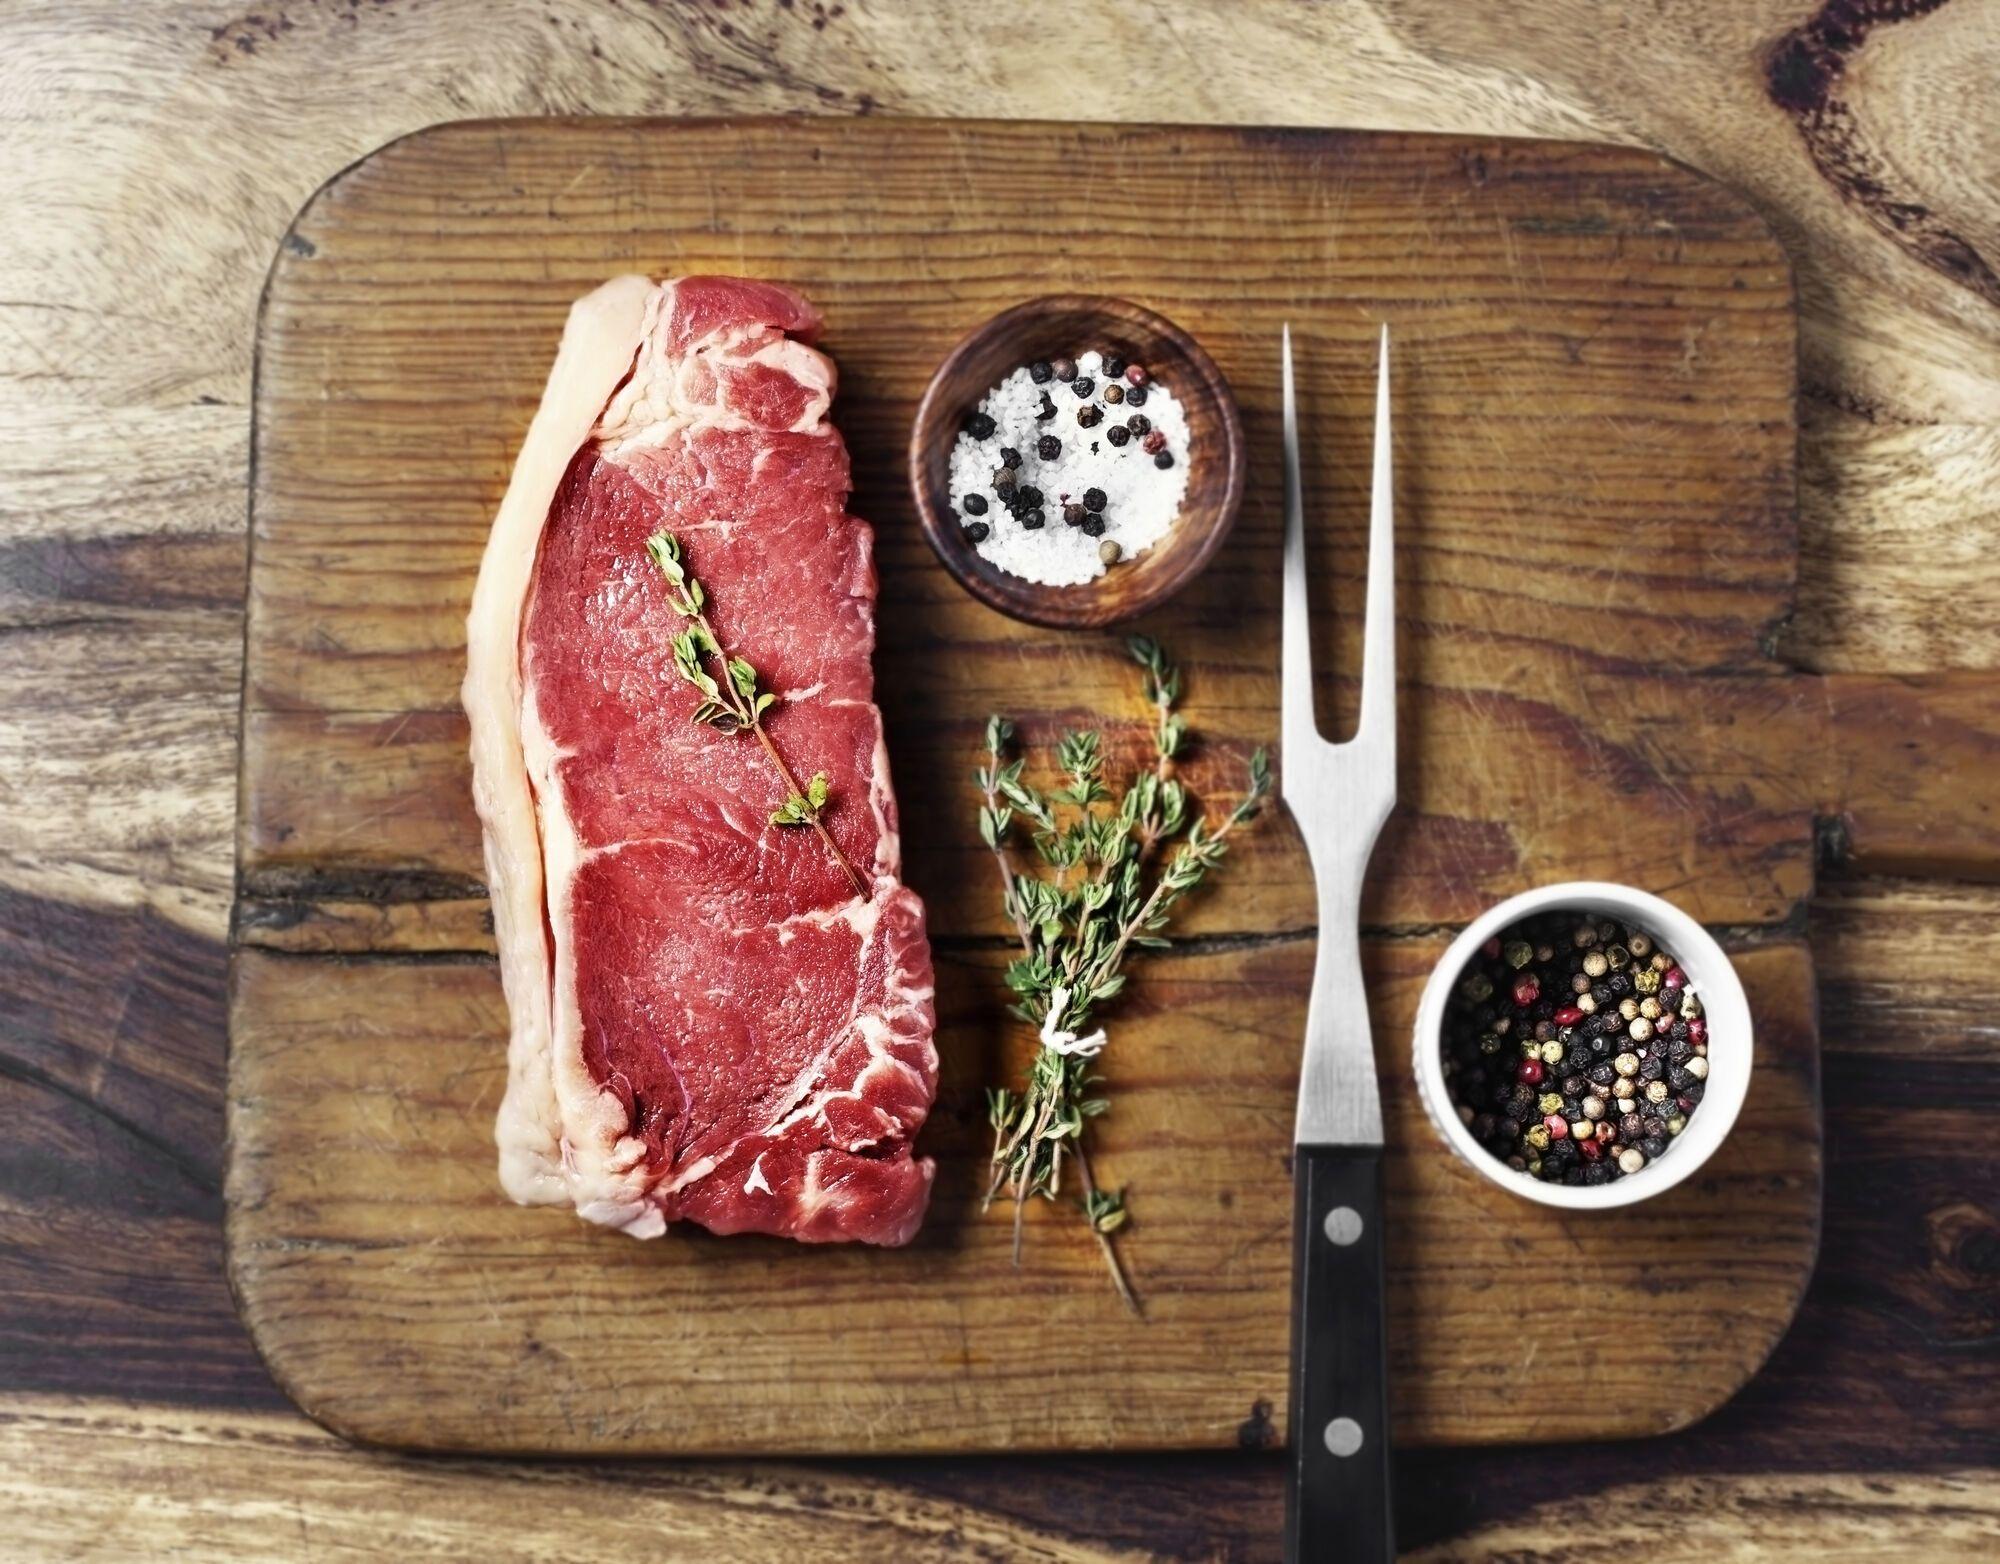 Мясо маринуйте не меньше 1 часа